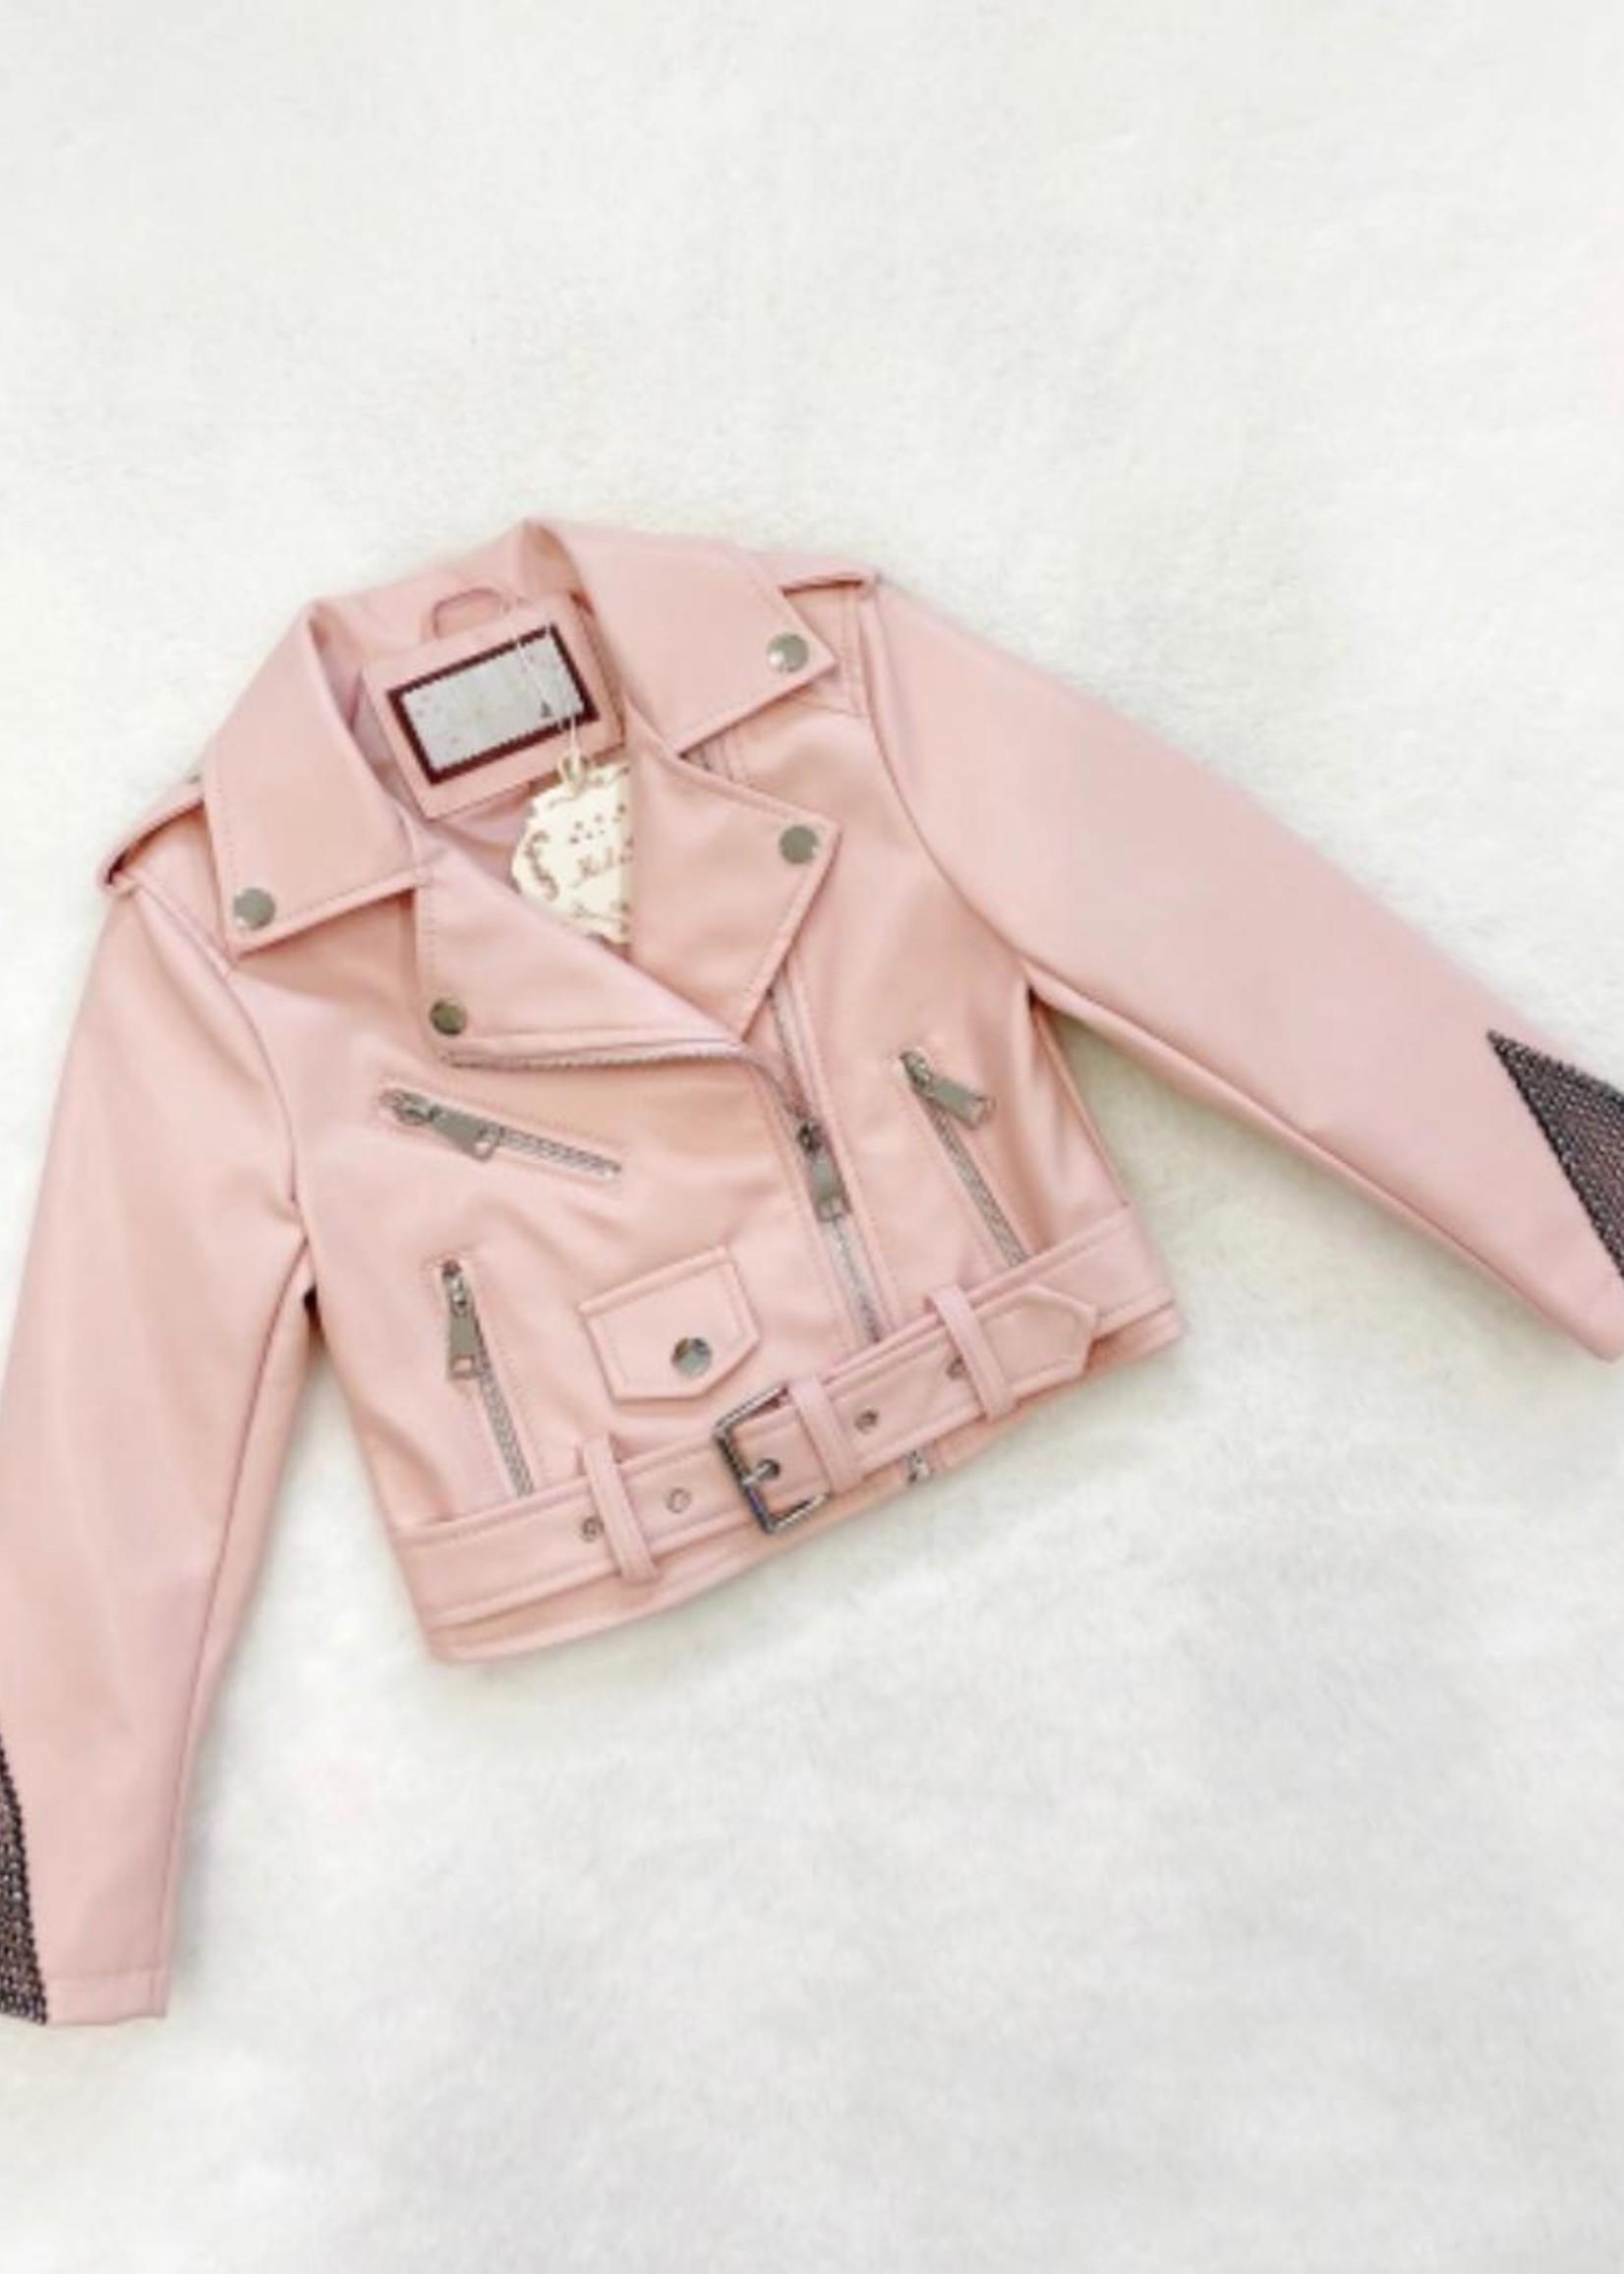 Divanis Divanis leather jacket pink